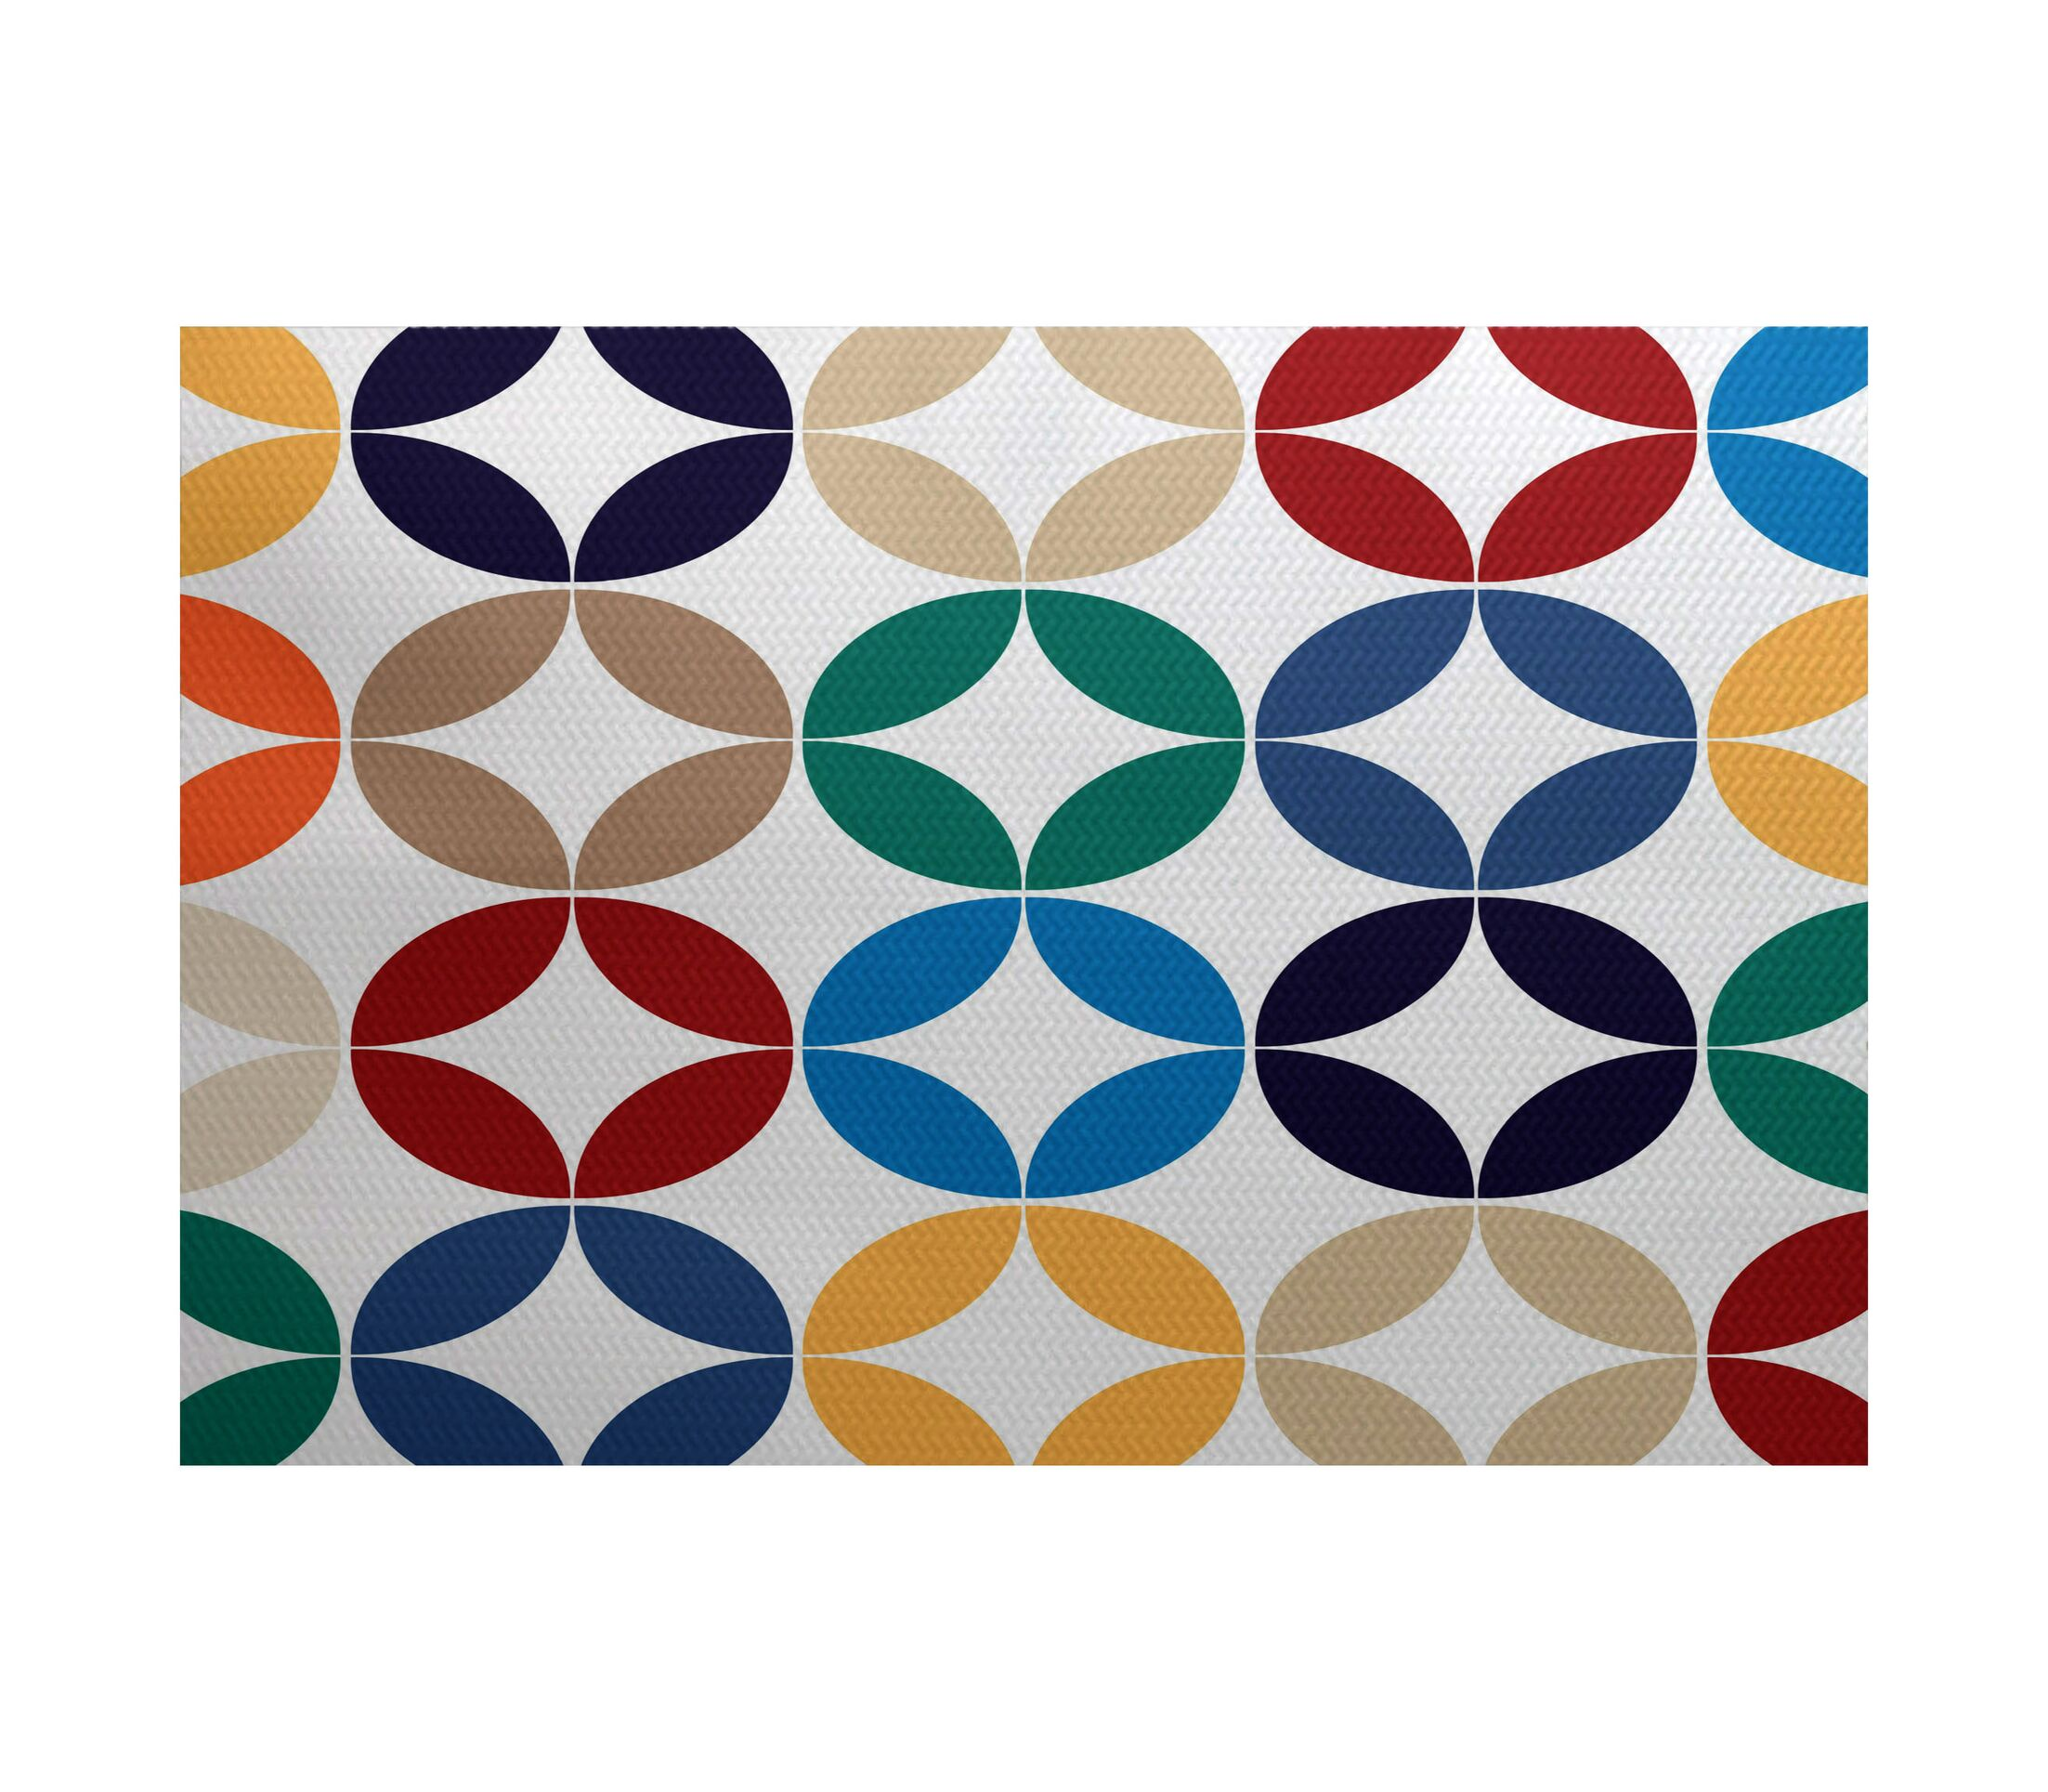 Francisco Green/Blue Indoor/Outdoor Area Rug Rug Size: Rectangle 3' x 5'